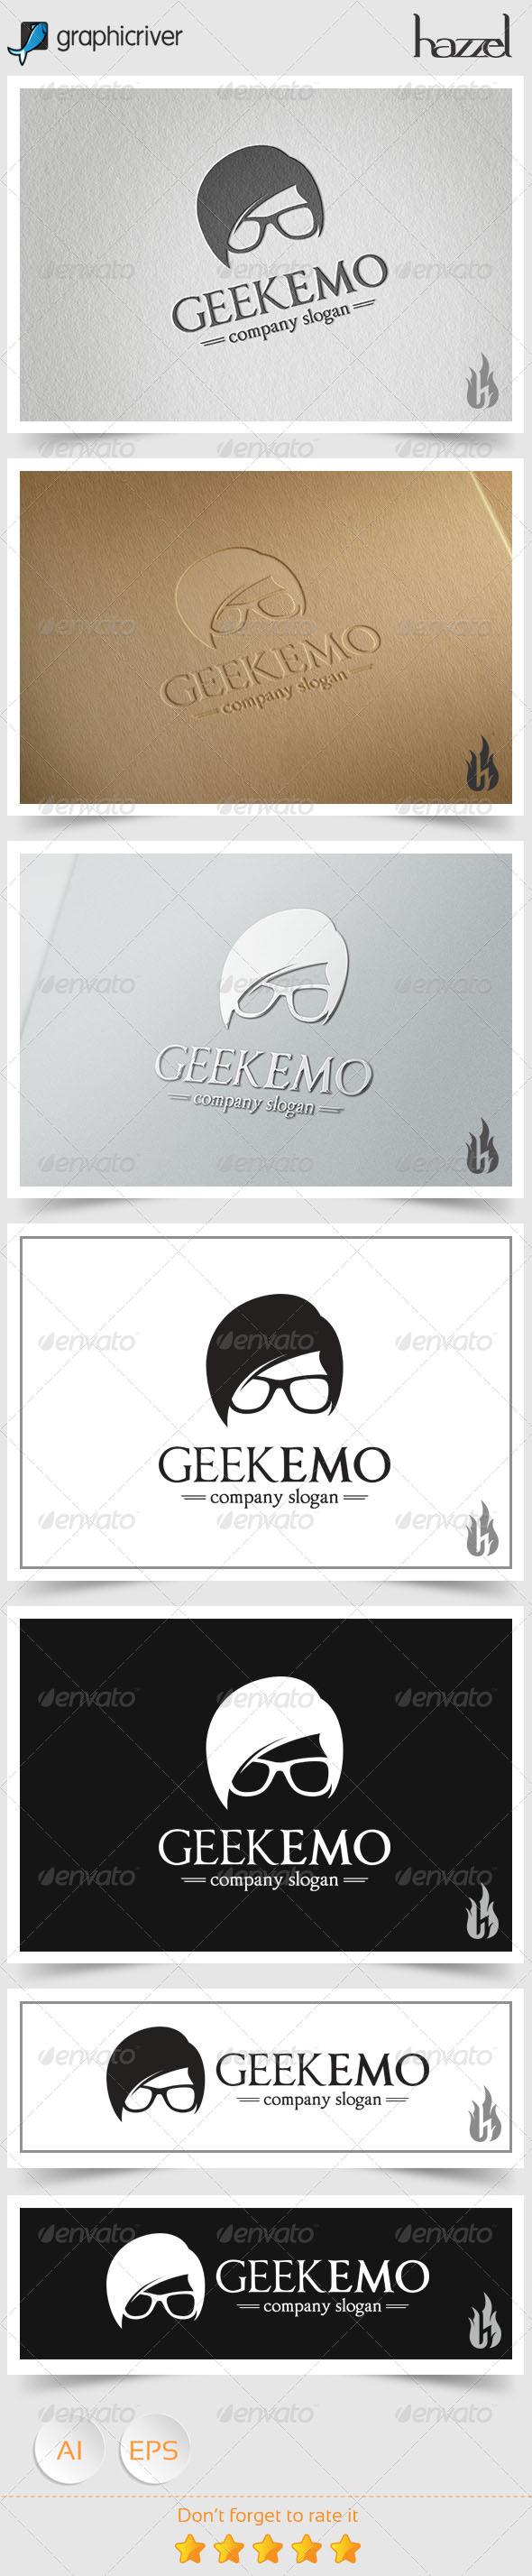 GraphicRiver Geek Emo Logo 8494464